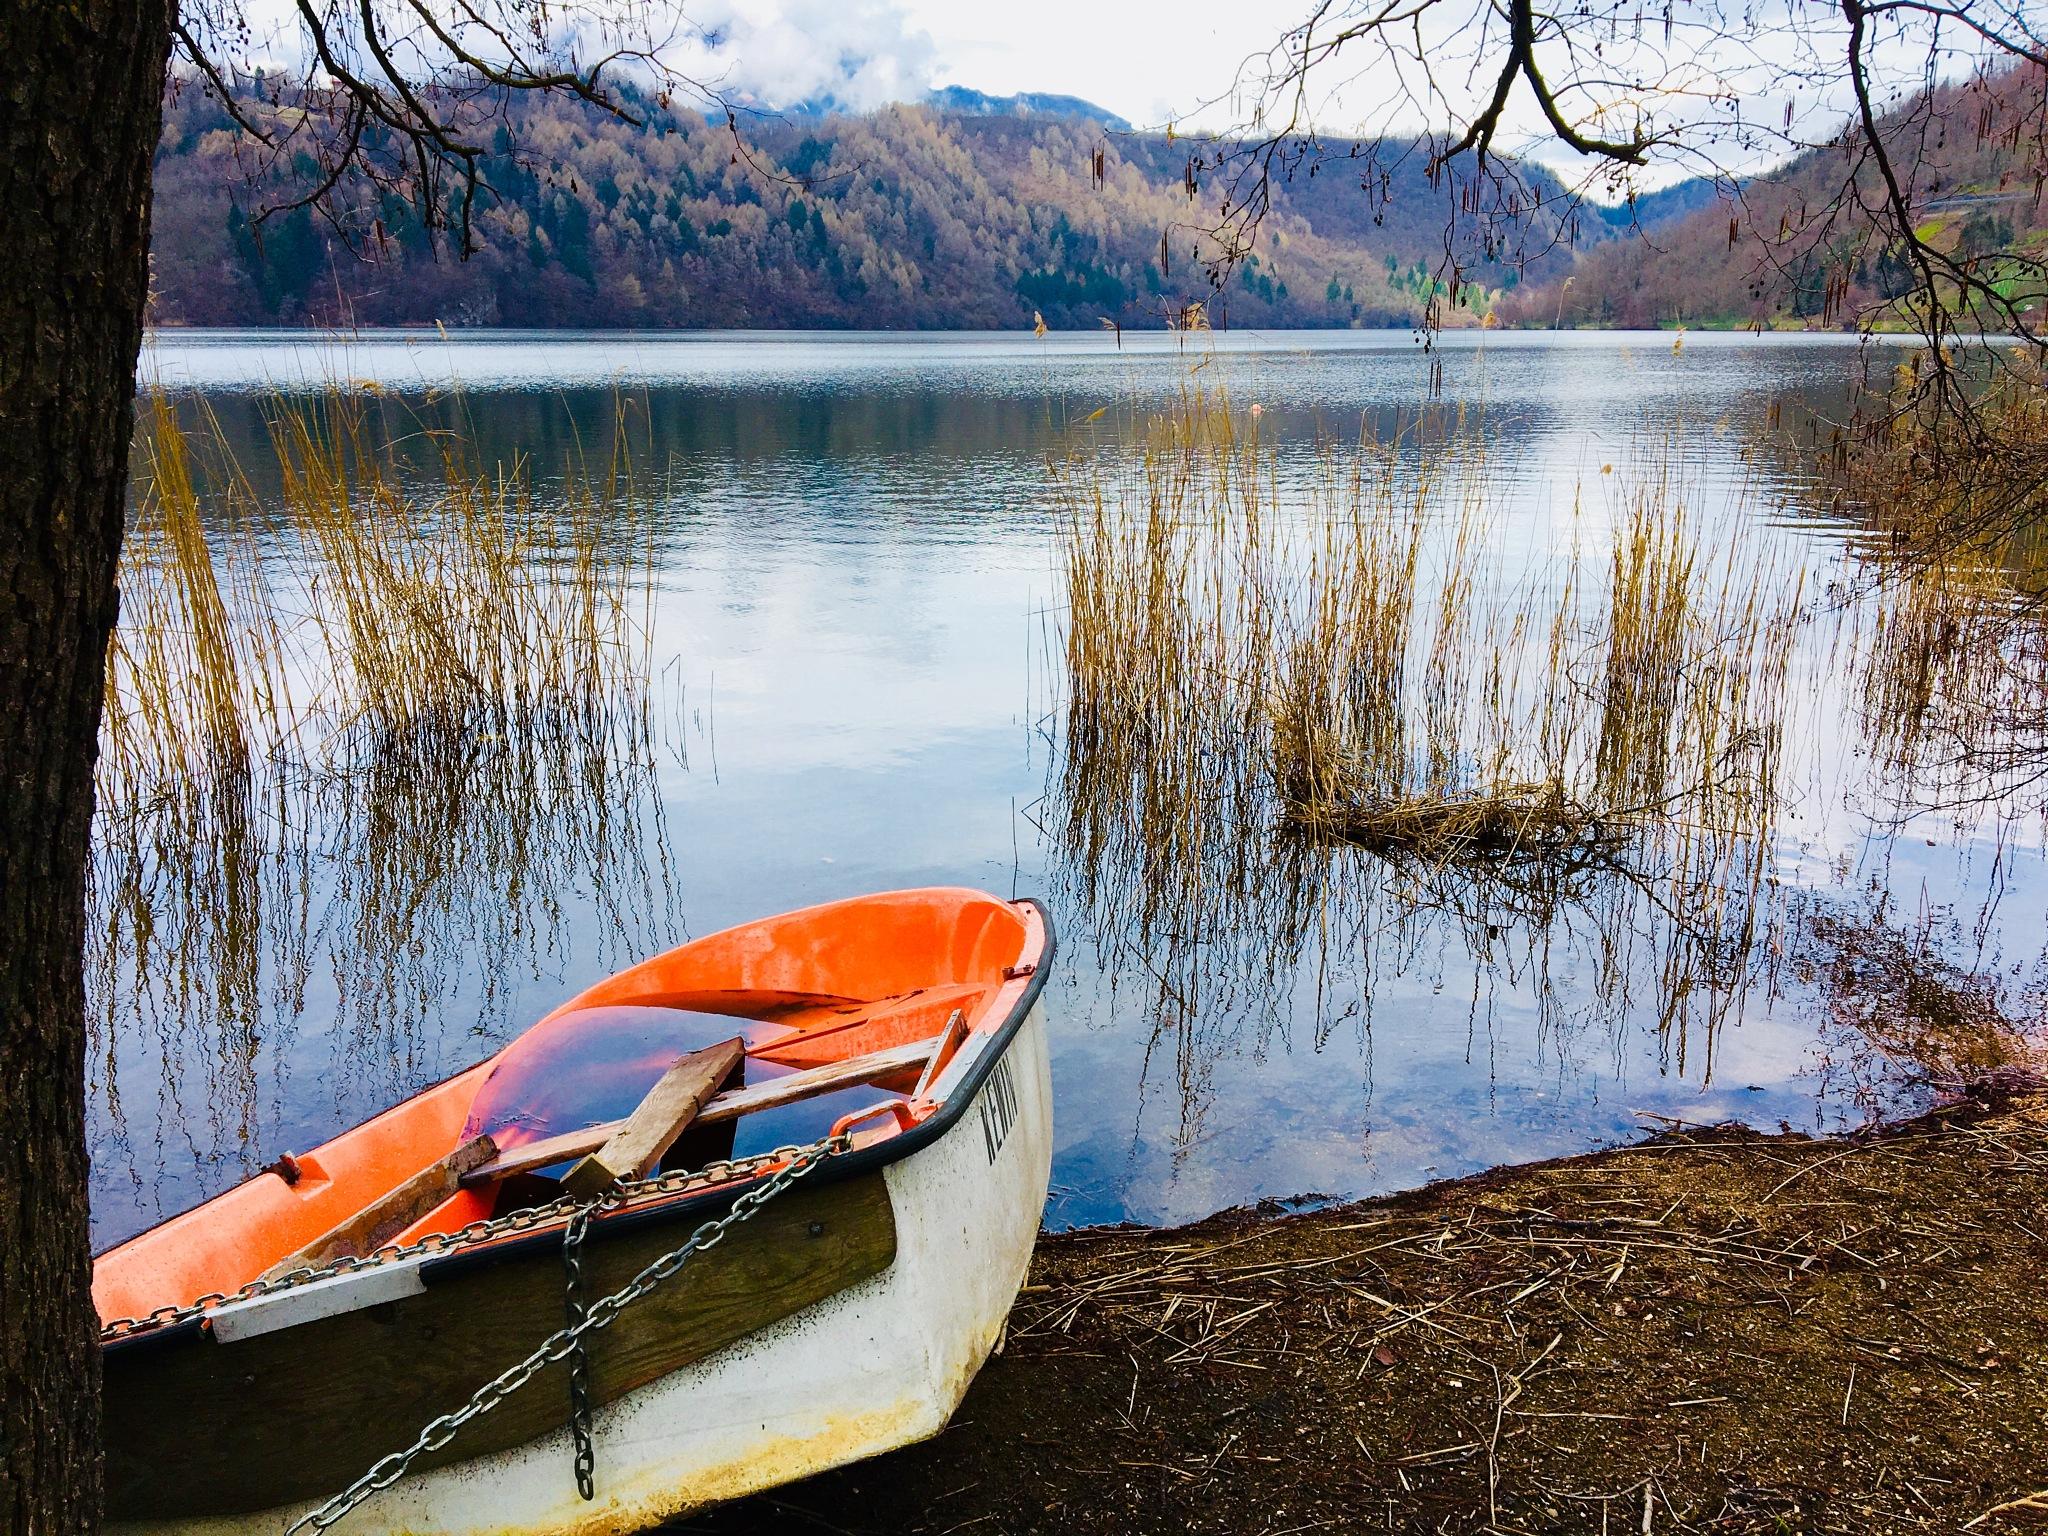 Lévico lake by ceciliacarcamo